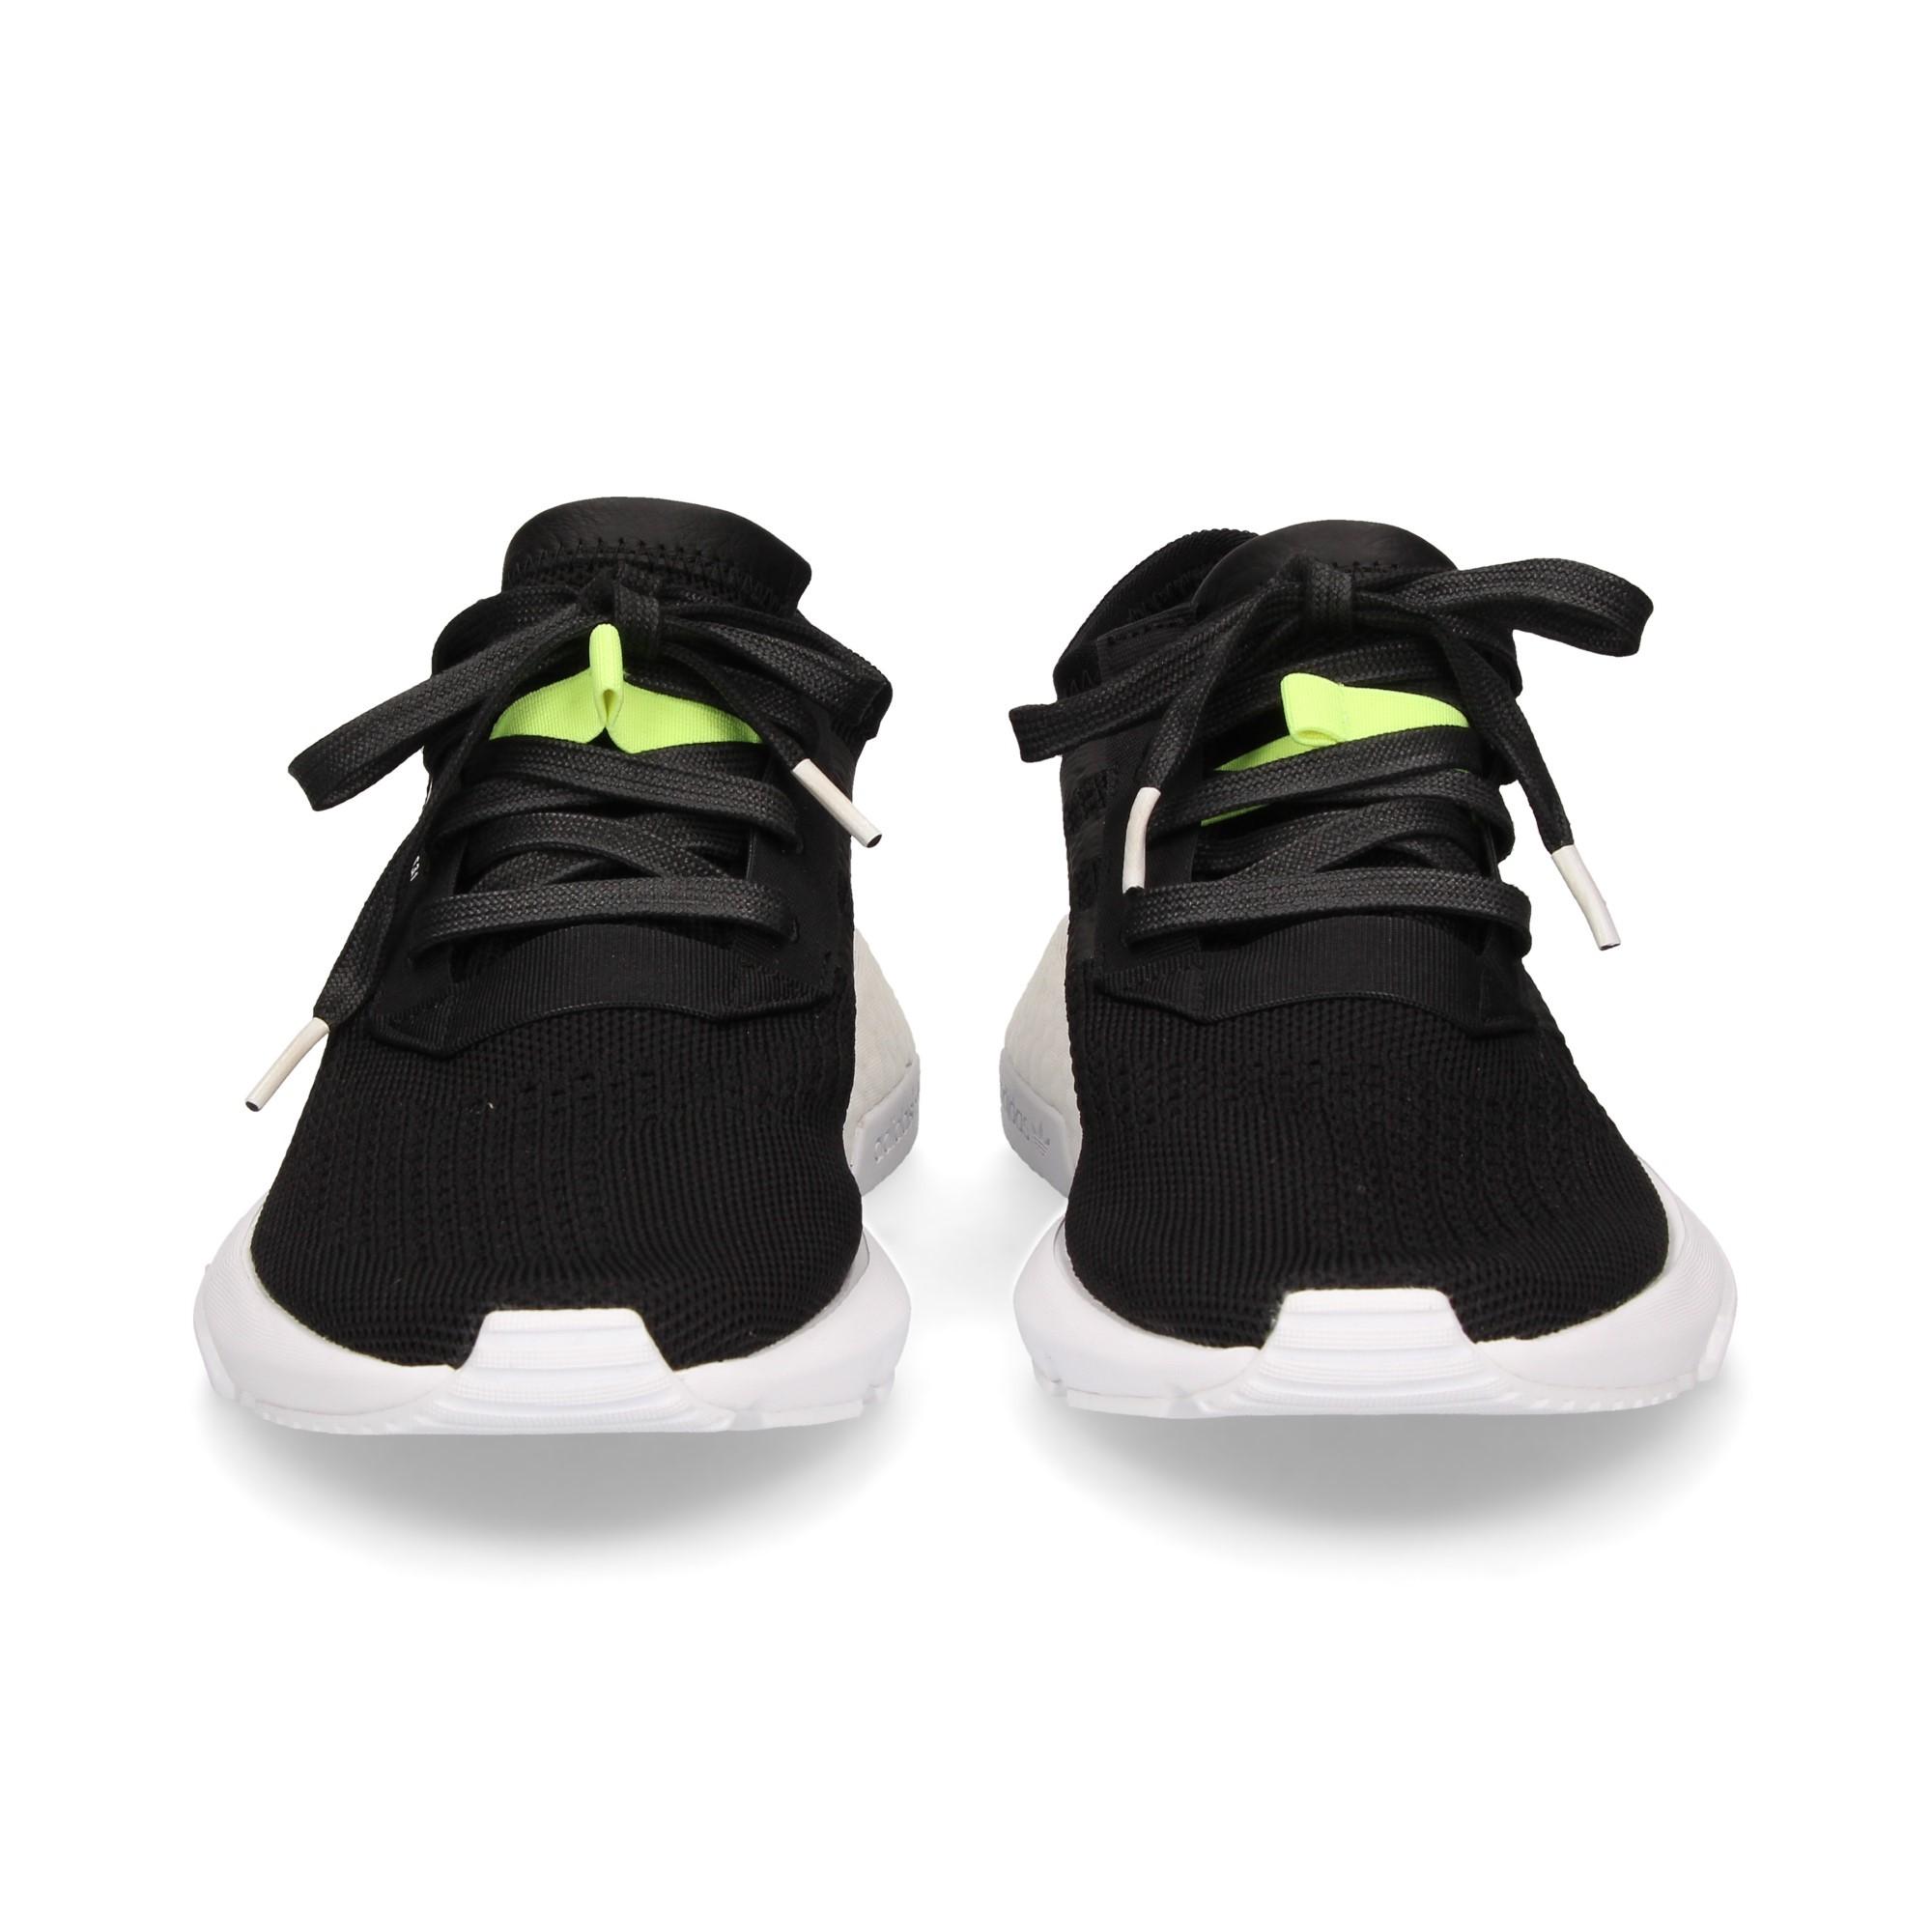 sporty-black-mesh